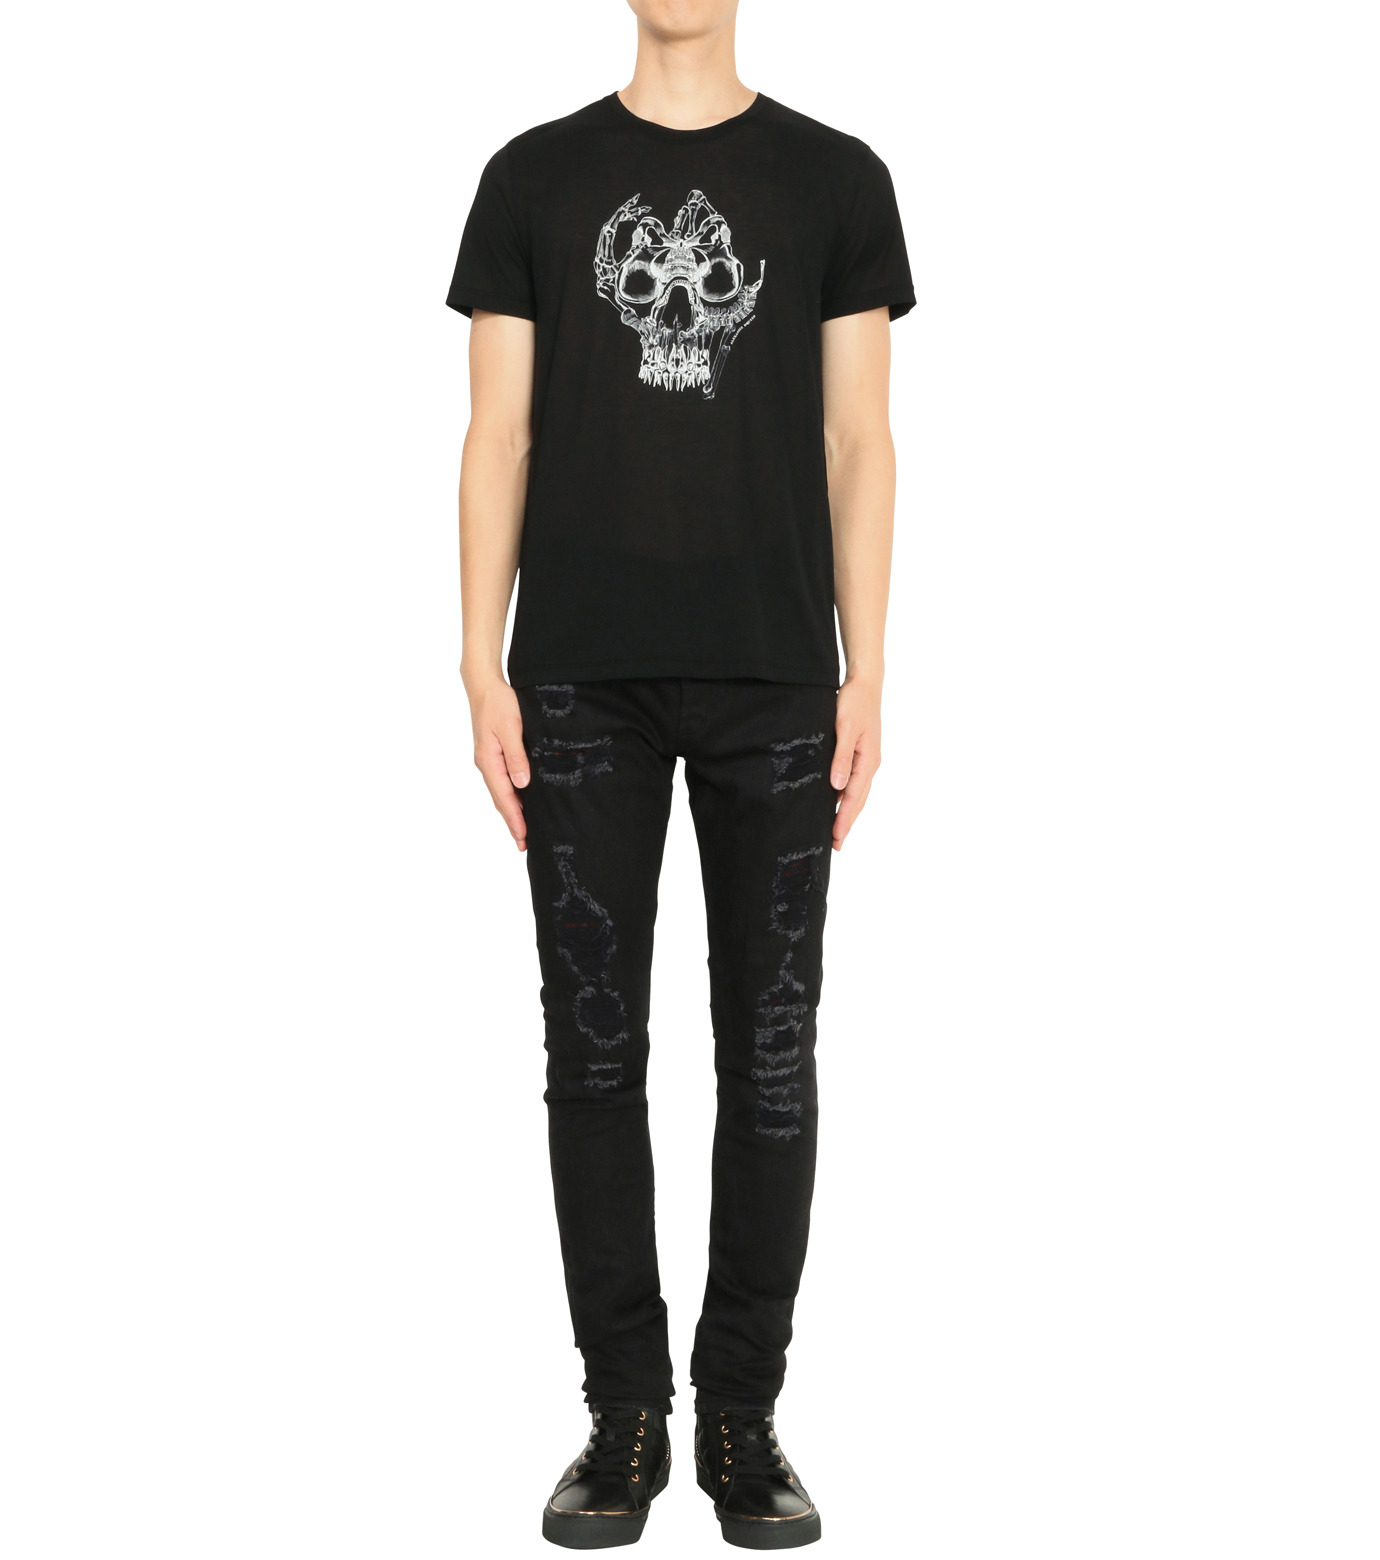 Alexander McQueen(アレキサンダーマックイーン)のPrint T-BLACK(カットソー/cut and sewn)-435907QHZT8-13 拡大詳細画像3